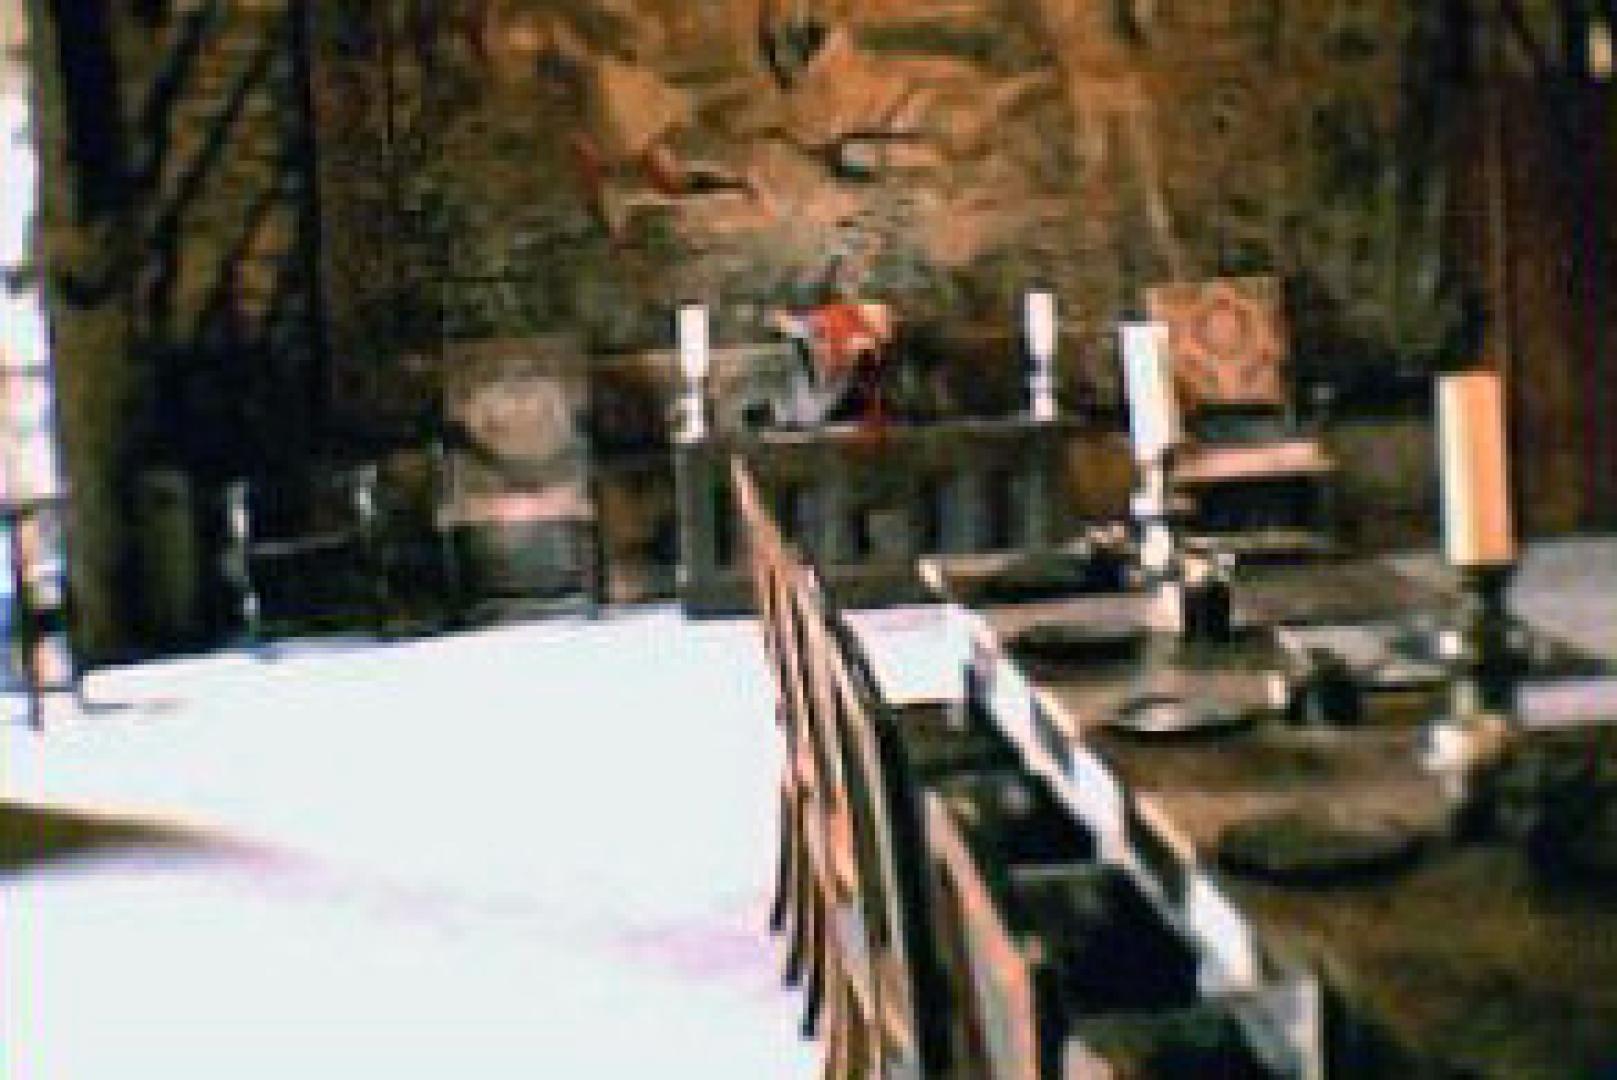 Chillingham-kastély, 5. kép